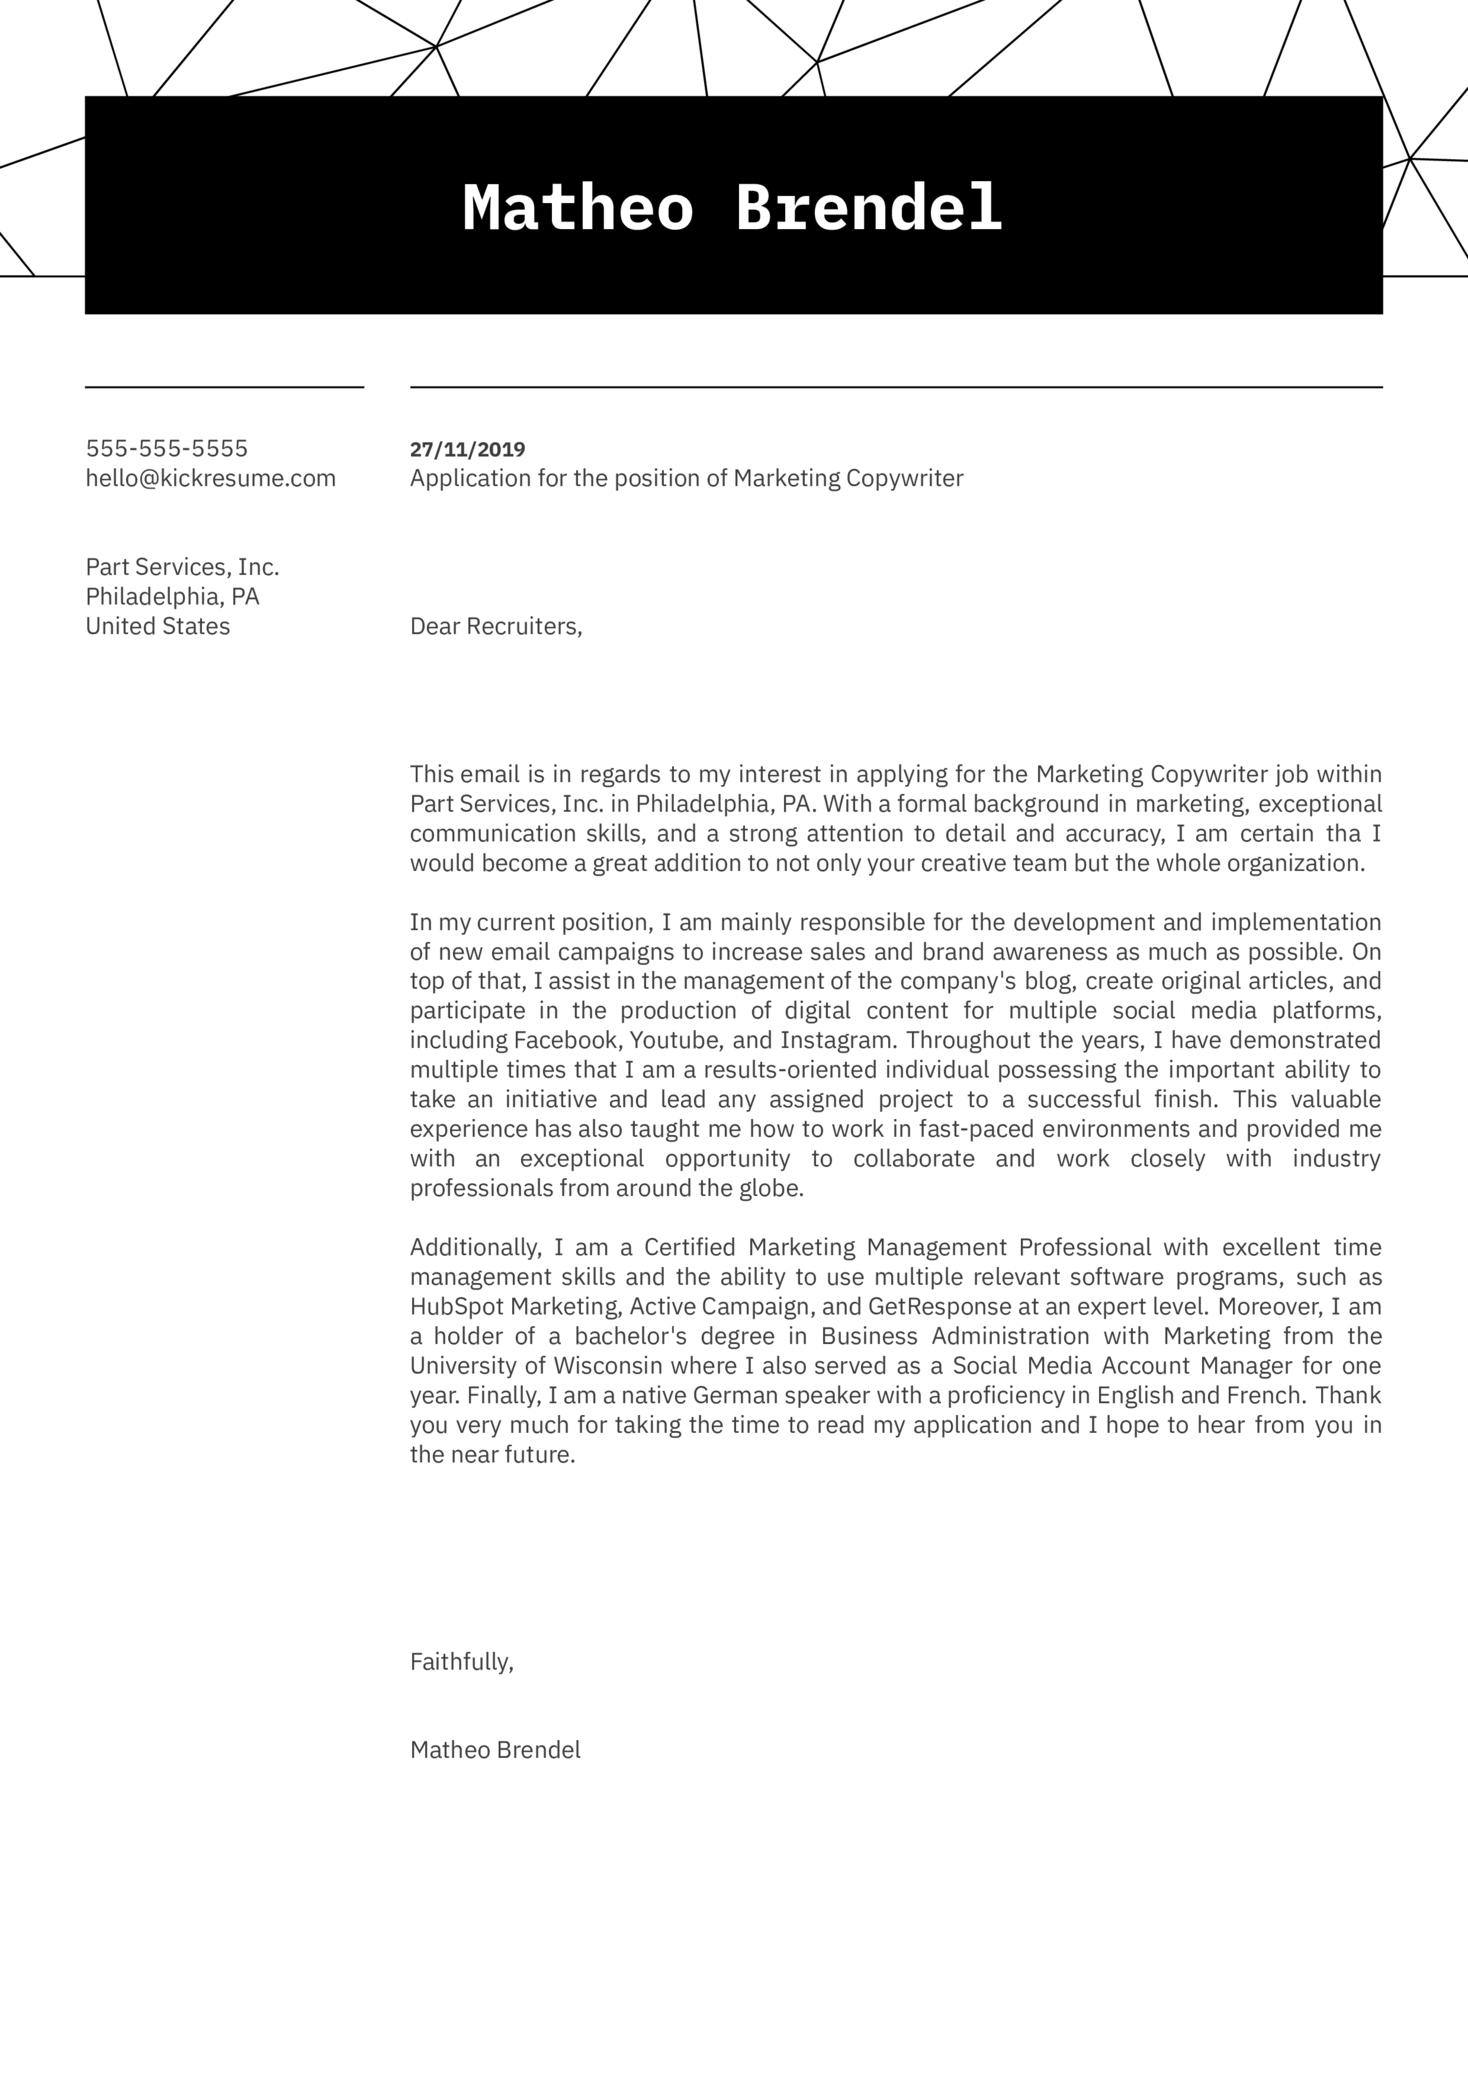 Marketing Copywriter Cover Letter Example